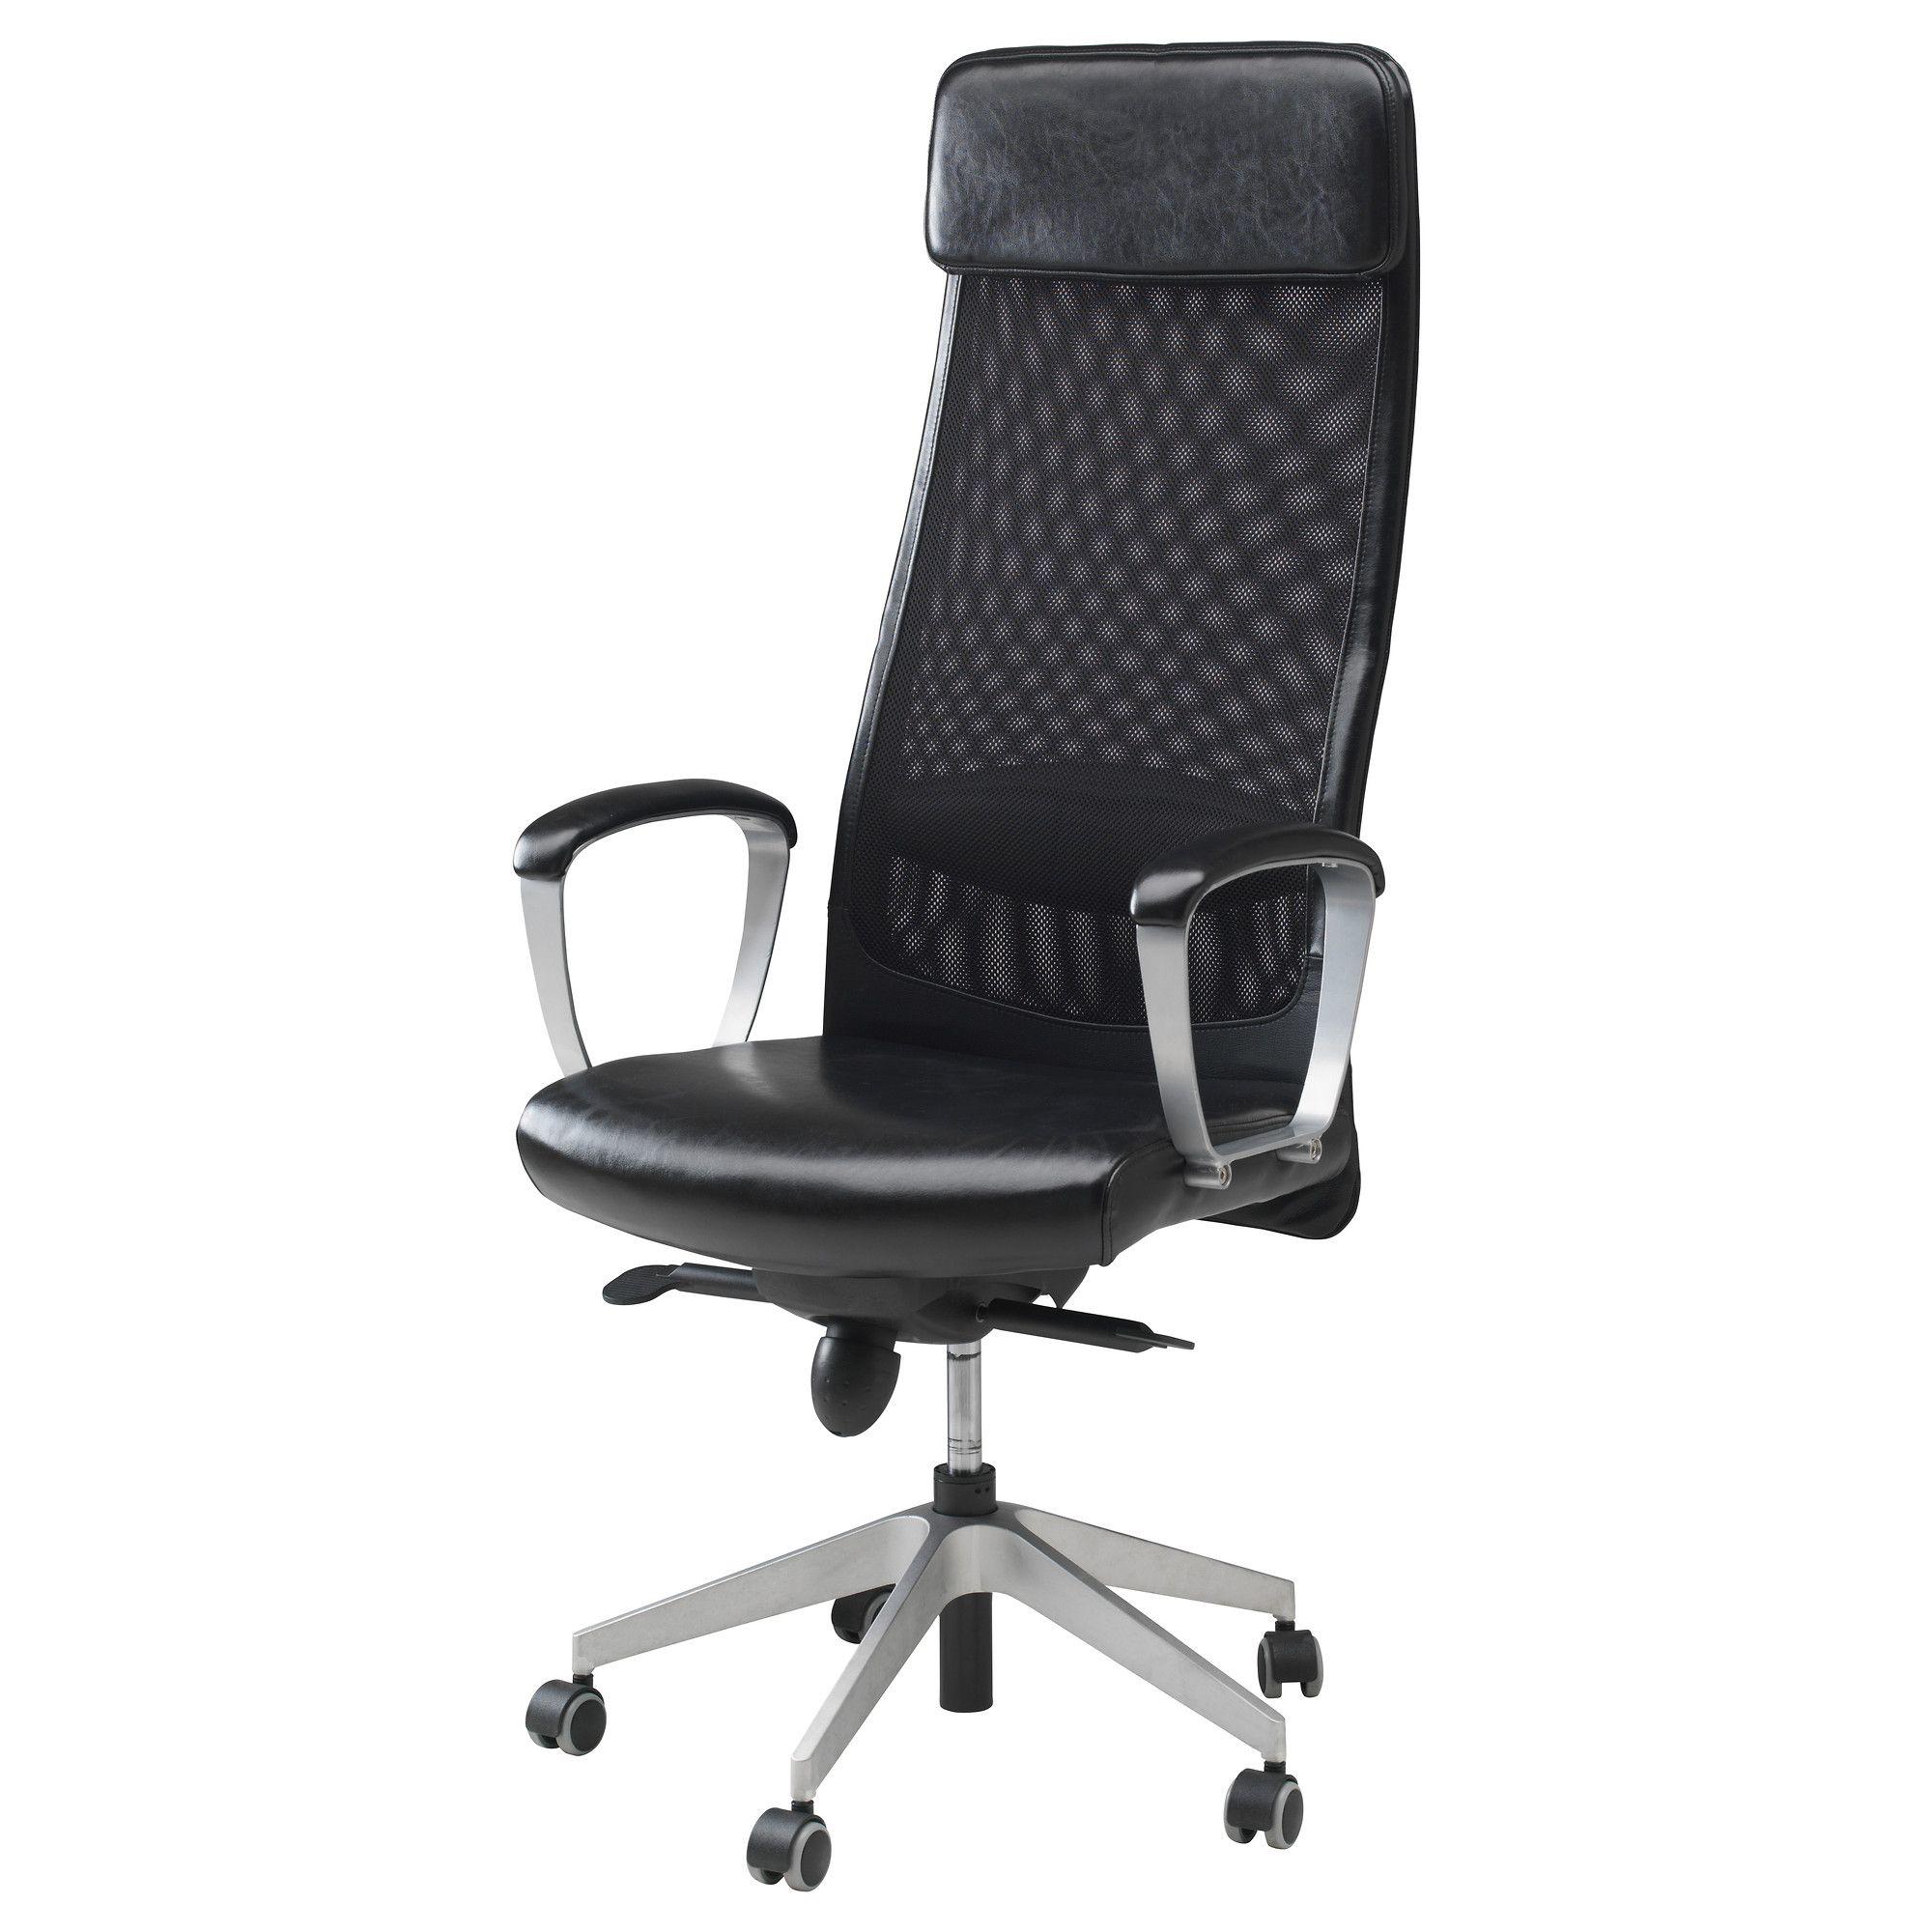 MARKUS Swivel chair Glose black Robust black